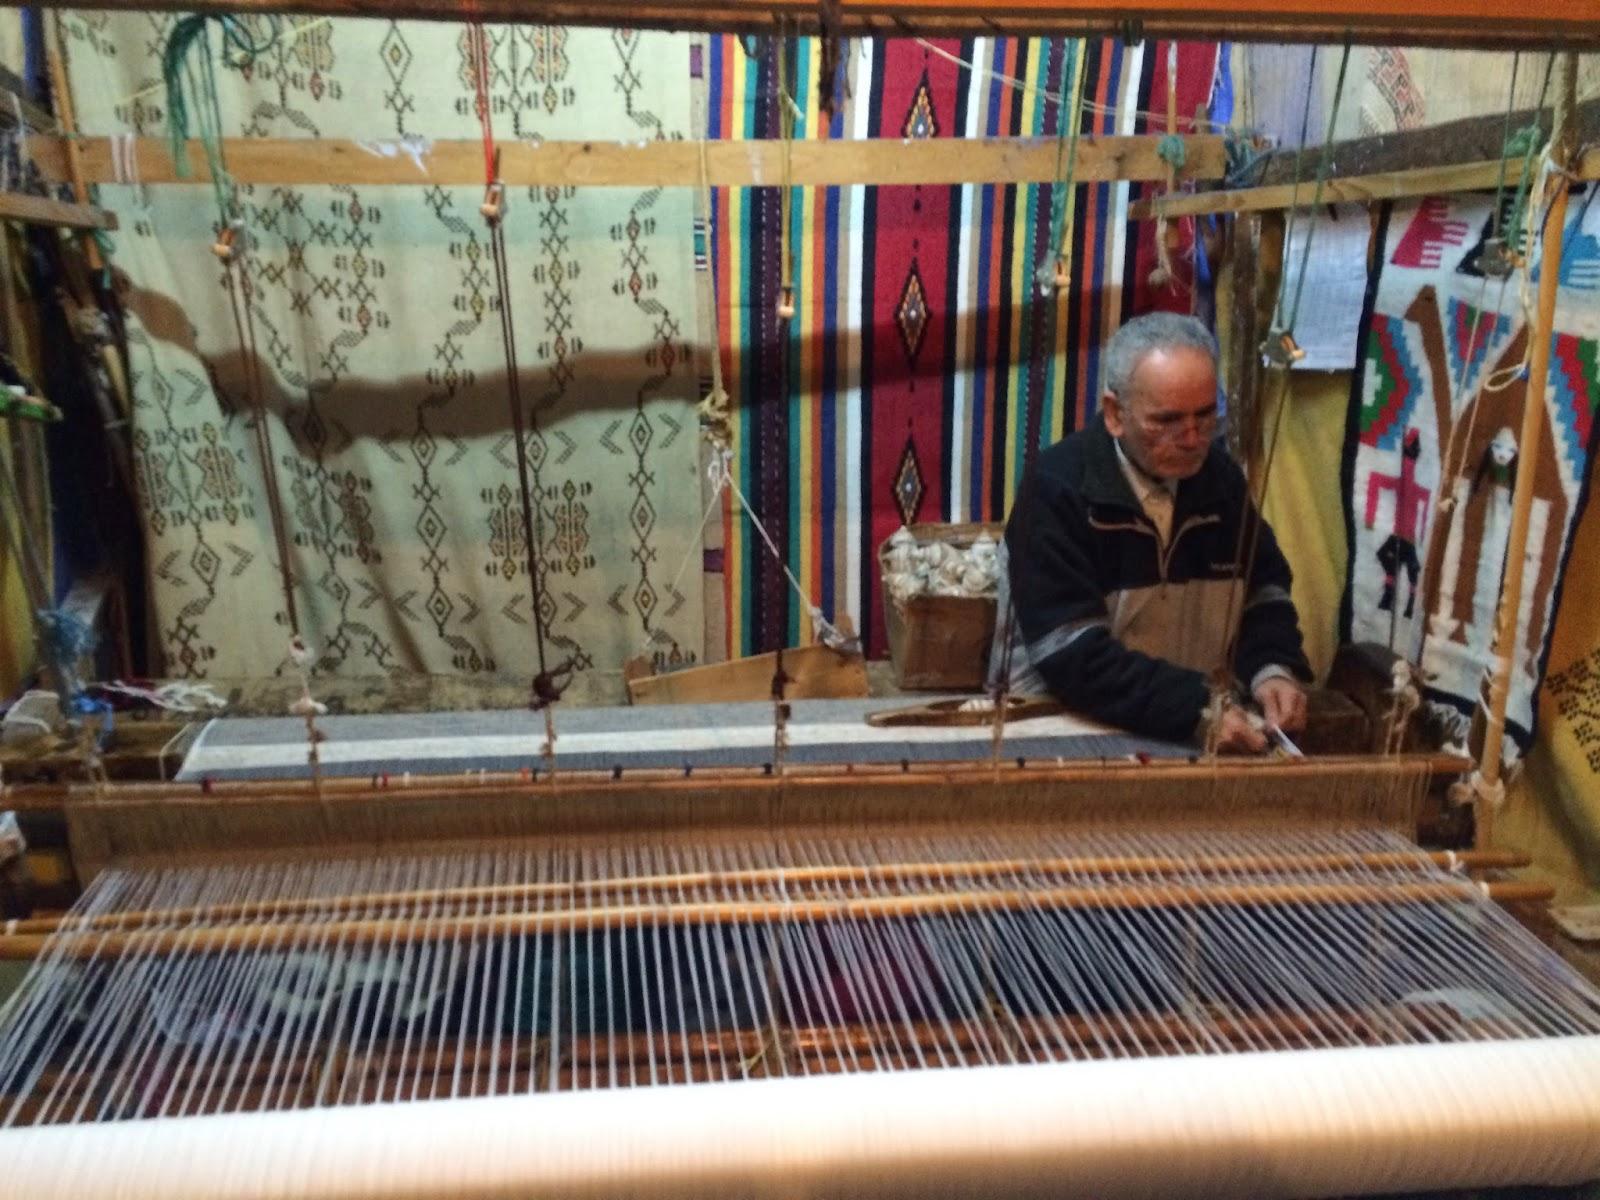 Chefchaouen/ Chaouen loom textiles